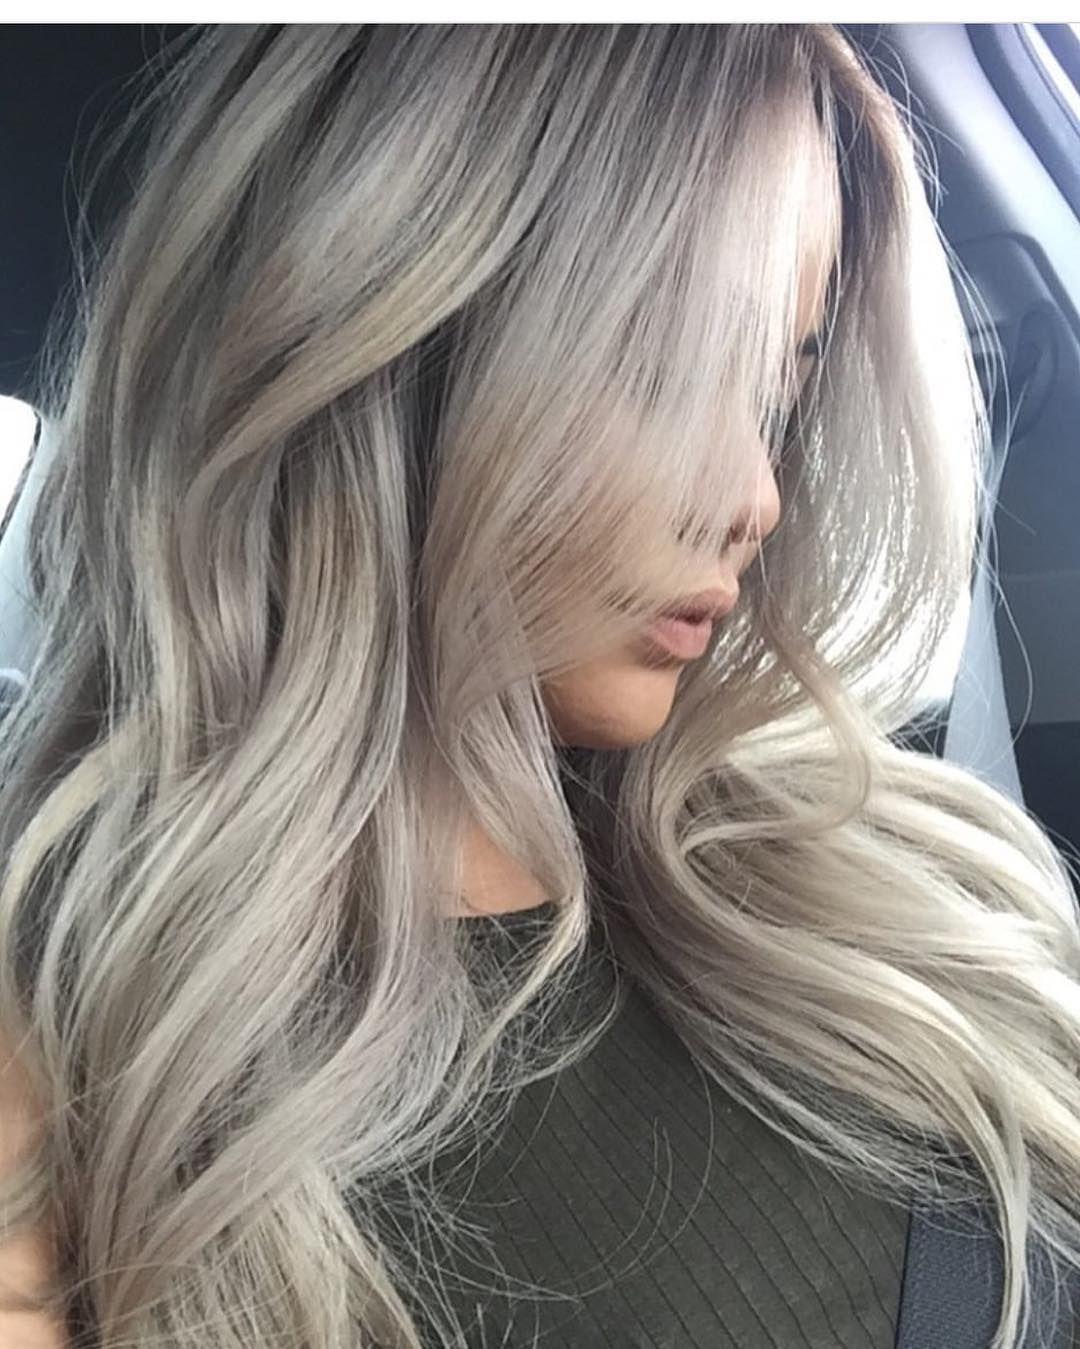 Ash White Blonde Hair Www Amandamajor Com Delray Indianapolis